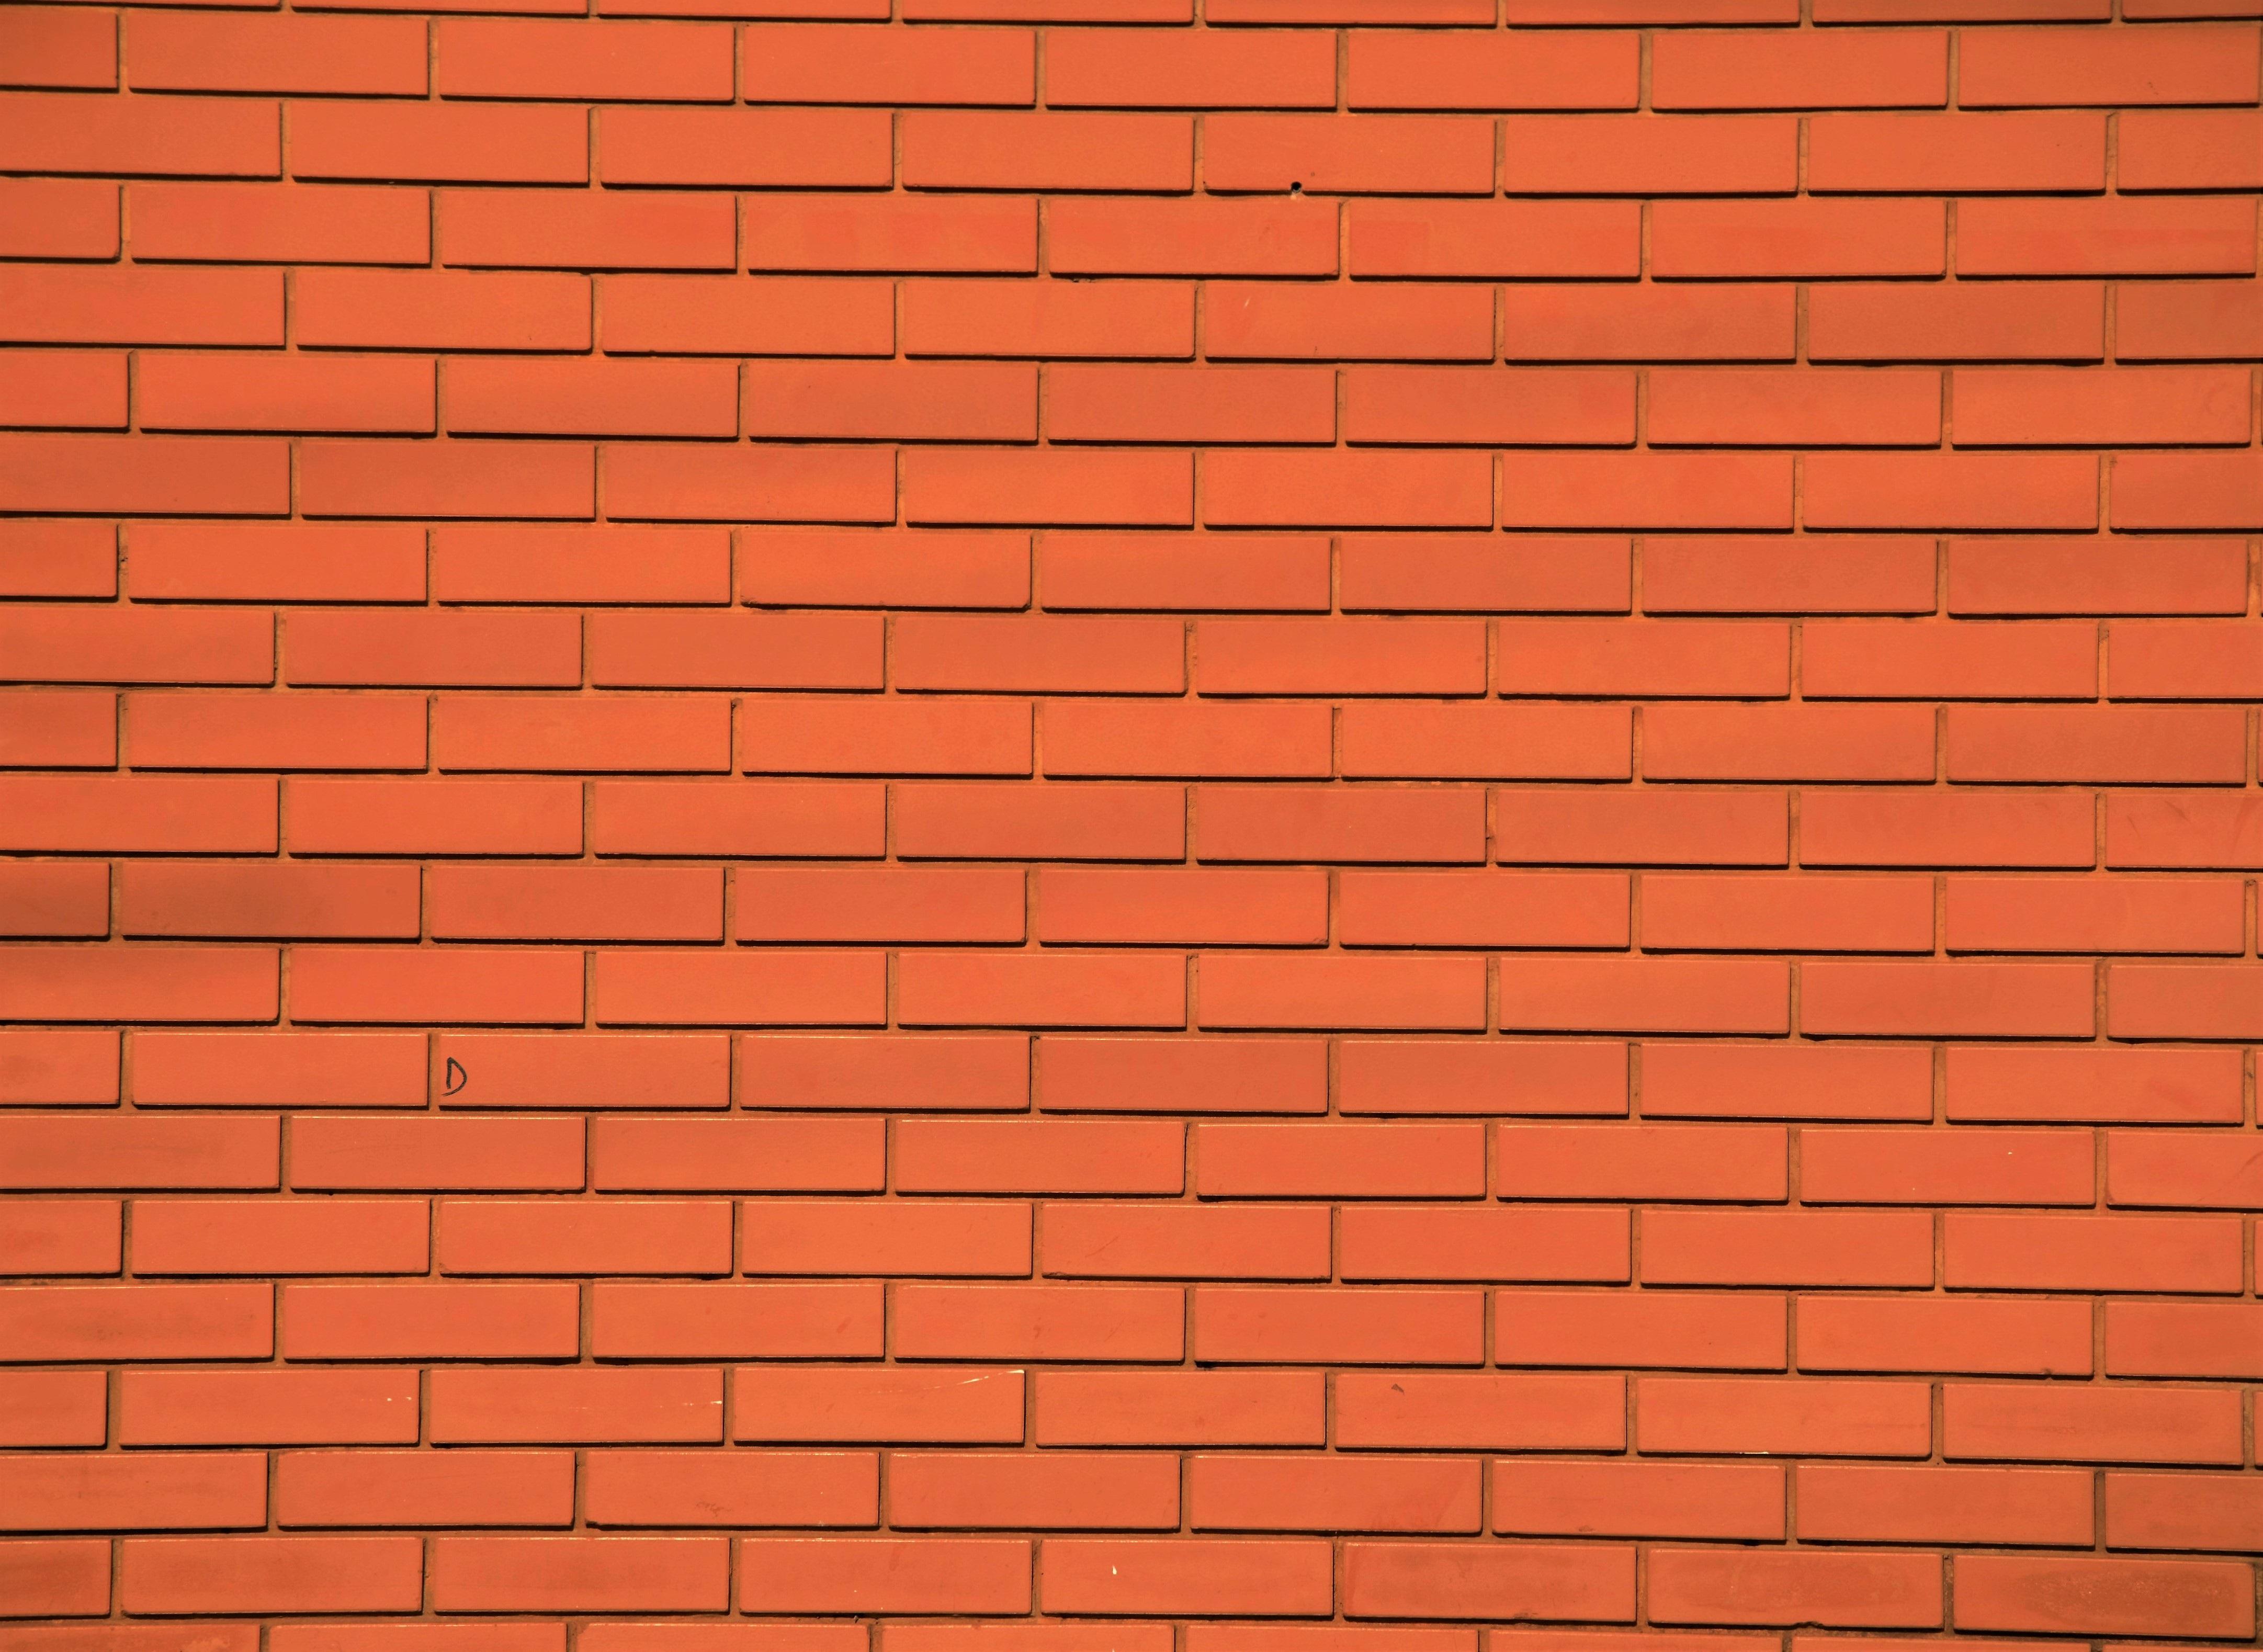 Yellow Surface  Free Stock Photo